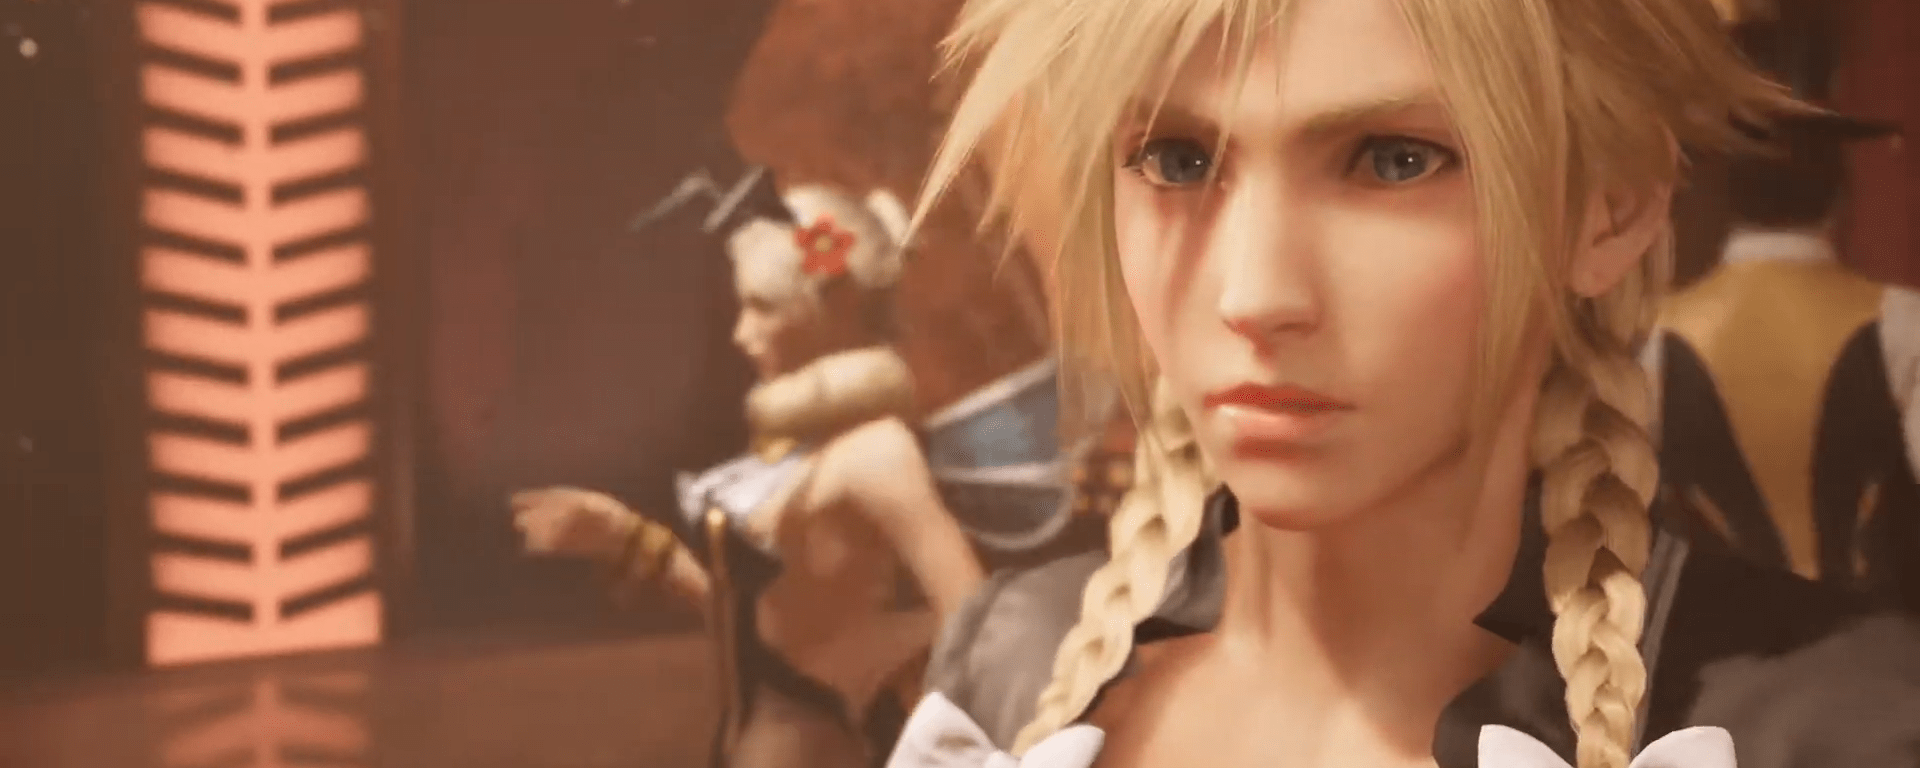 Final Fantasy VII Remake - Cross Dressing Cloud